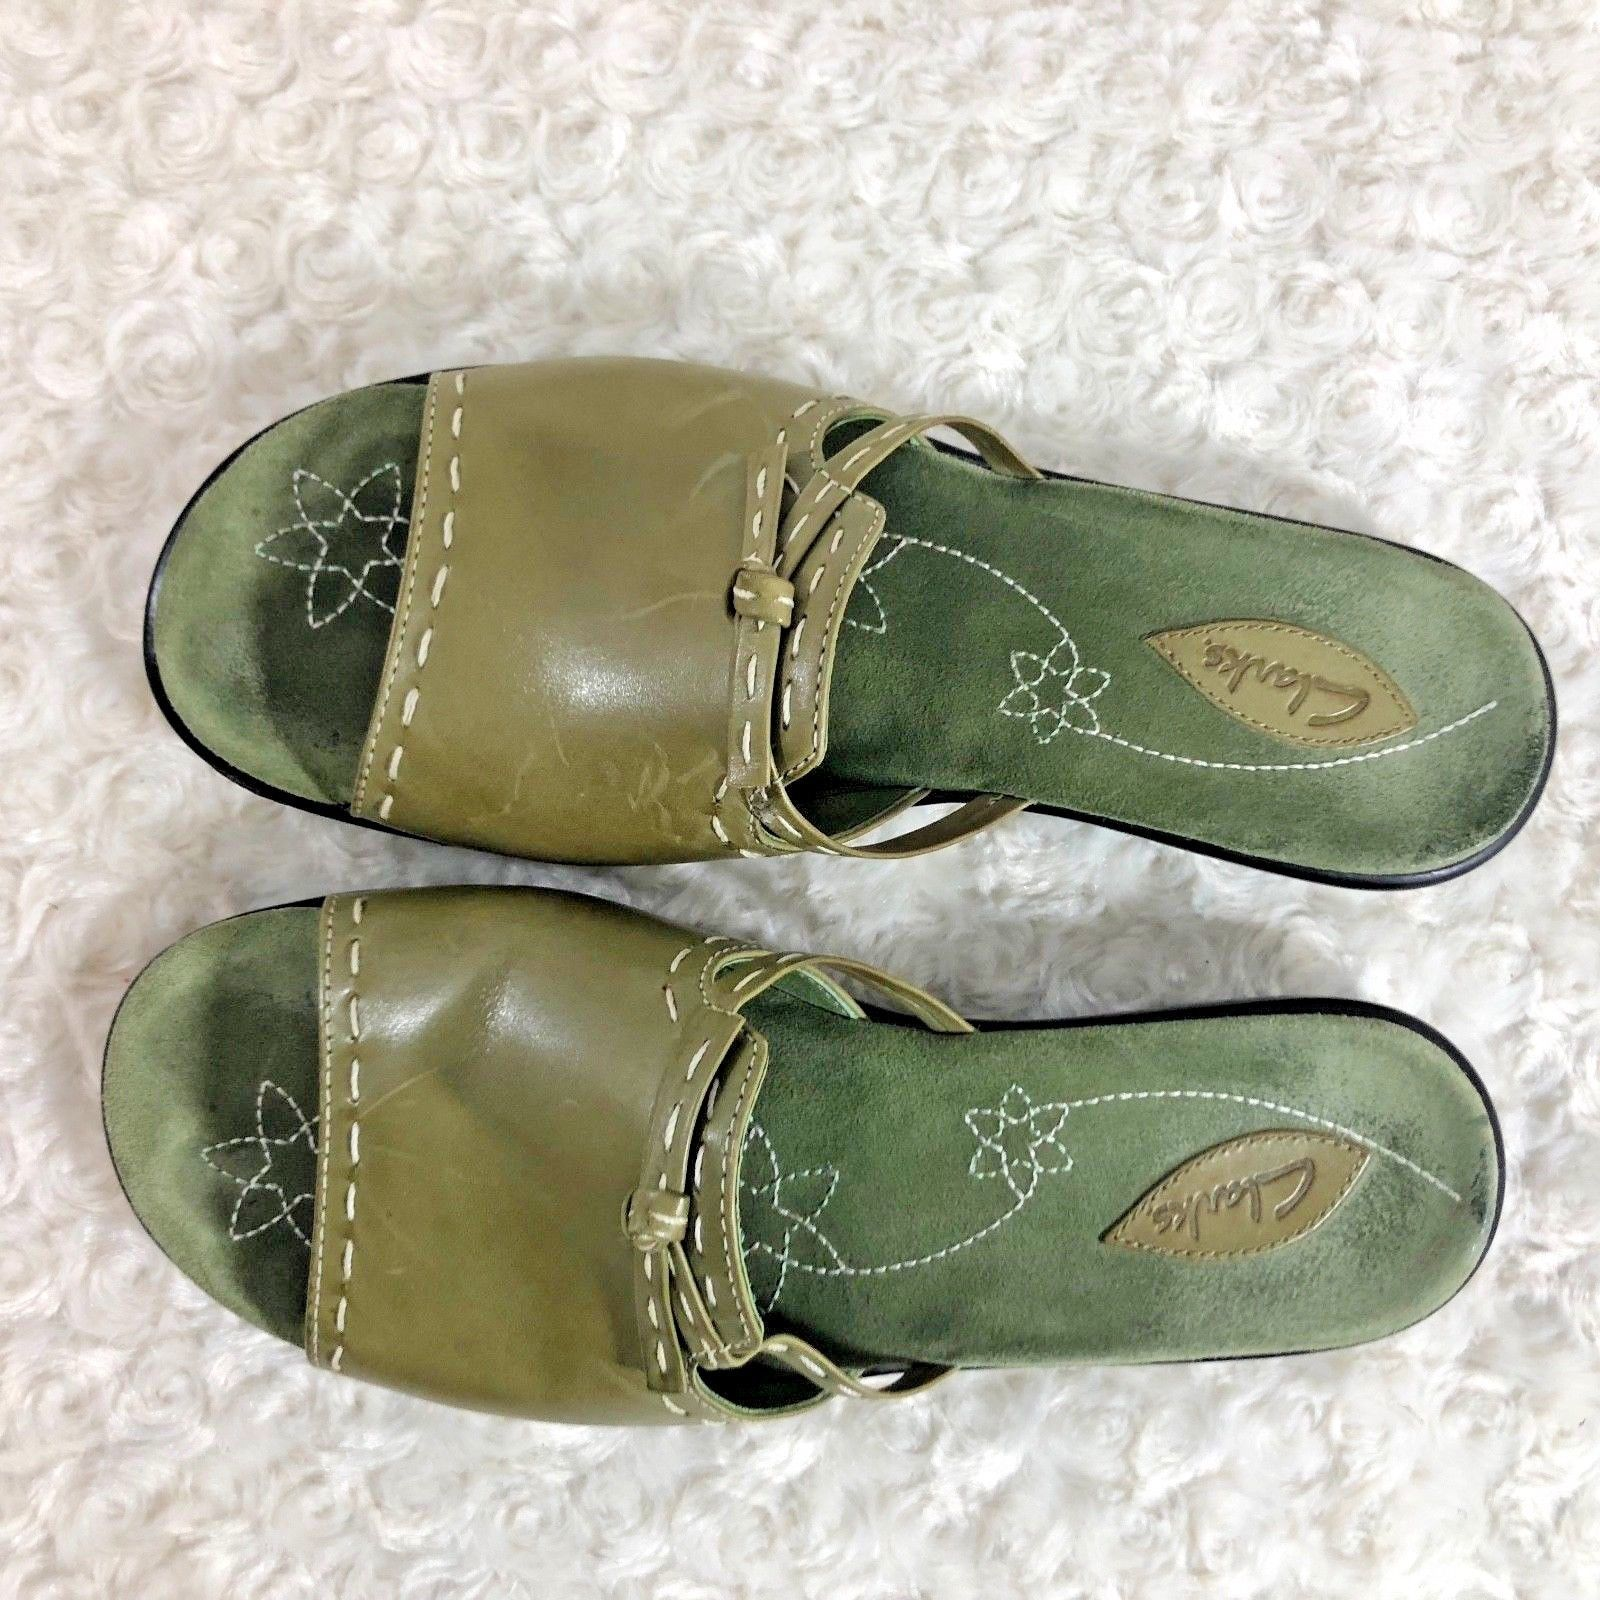 clarks Womens Sz 9 M Green Leather Slide Slip On Flat Shoes